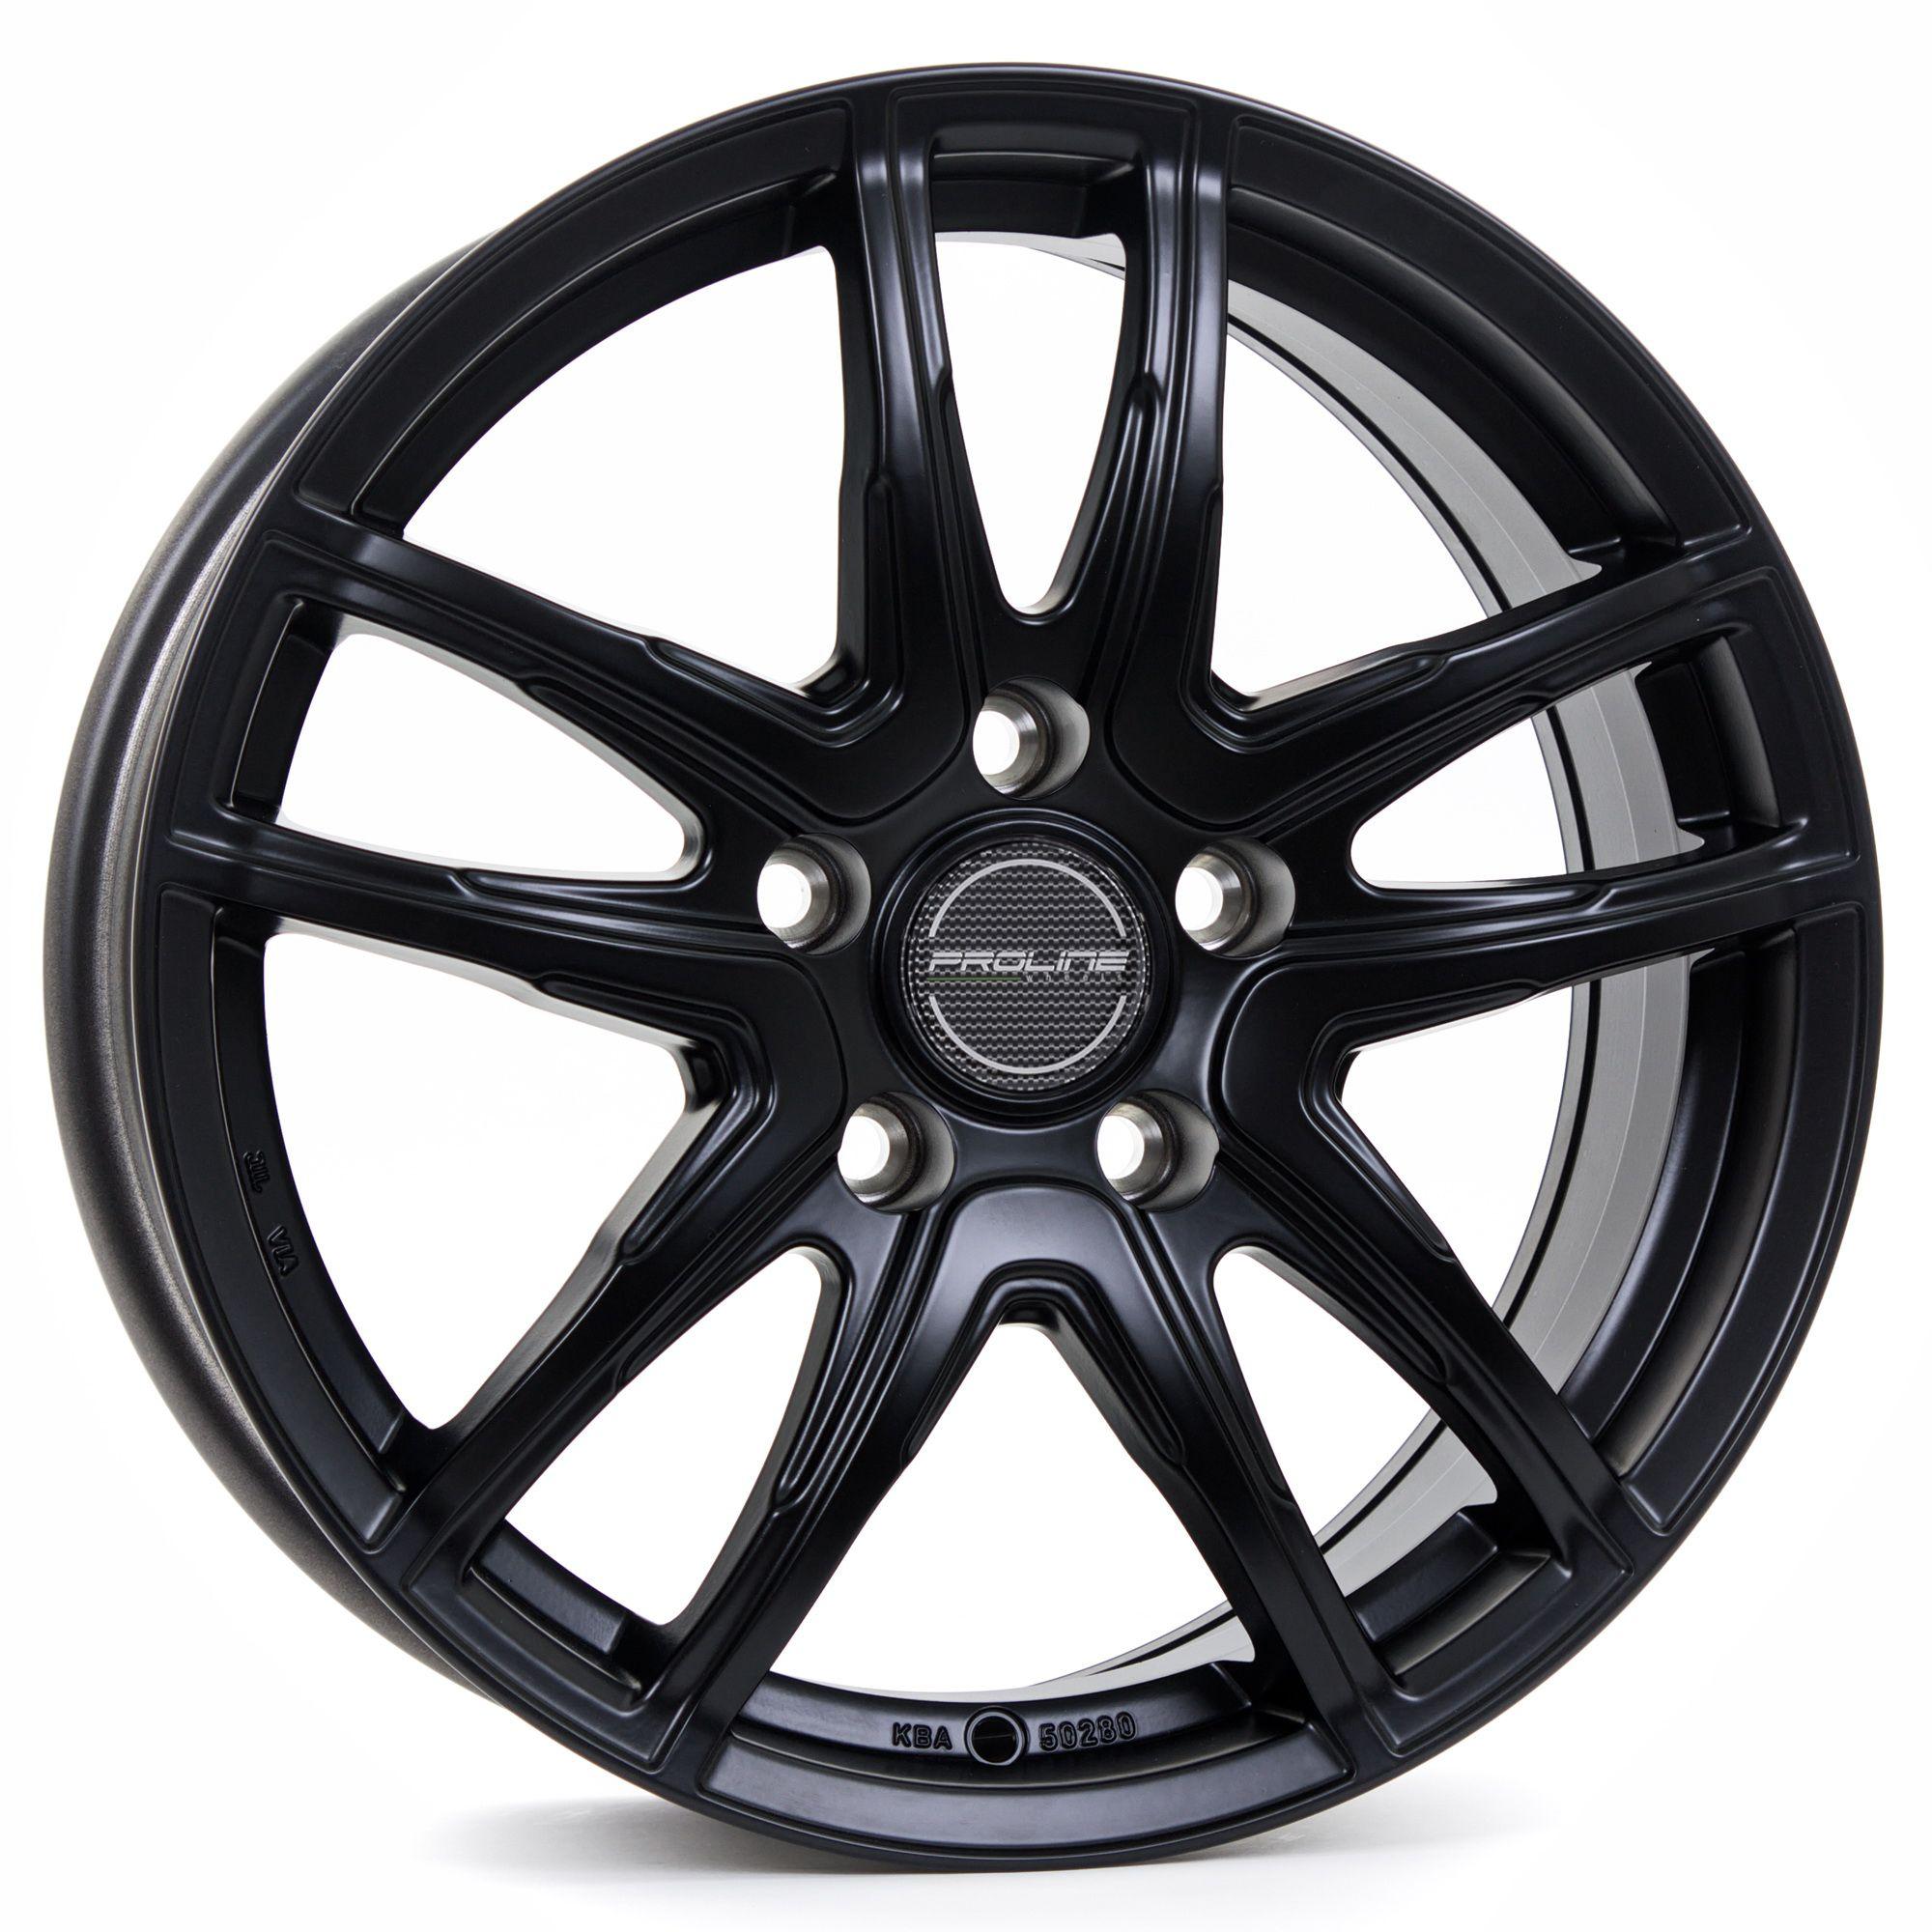 proline wheels vx100 felgen black matt schwarz in 16 zoll. Black Bedroom Furniture Sets. Home Design Ideas